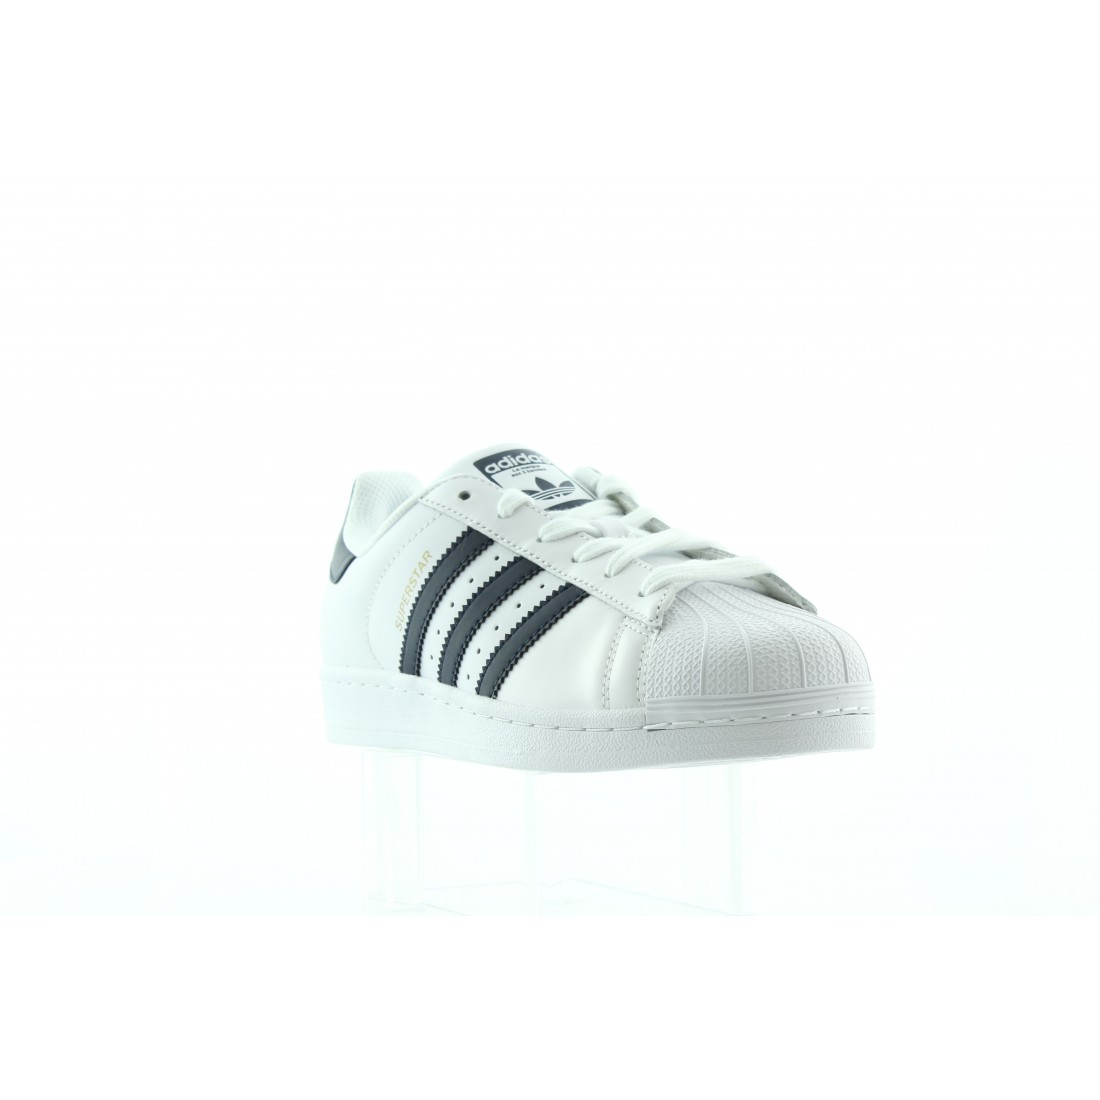 reputable site 07da3 7ab09 Sneakersy Adidas Superstar CM8082